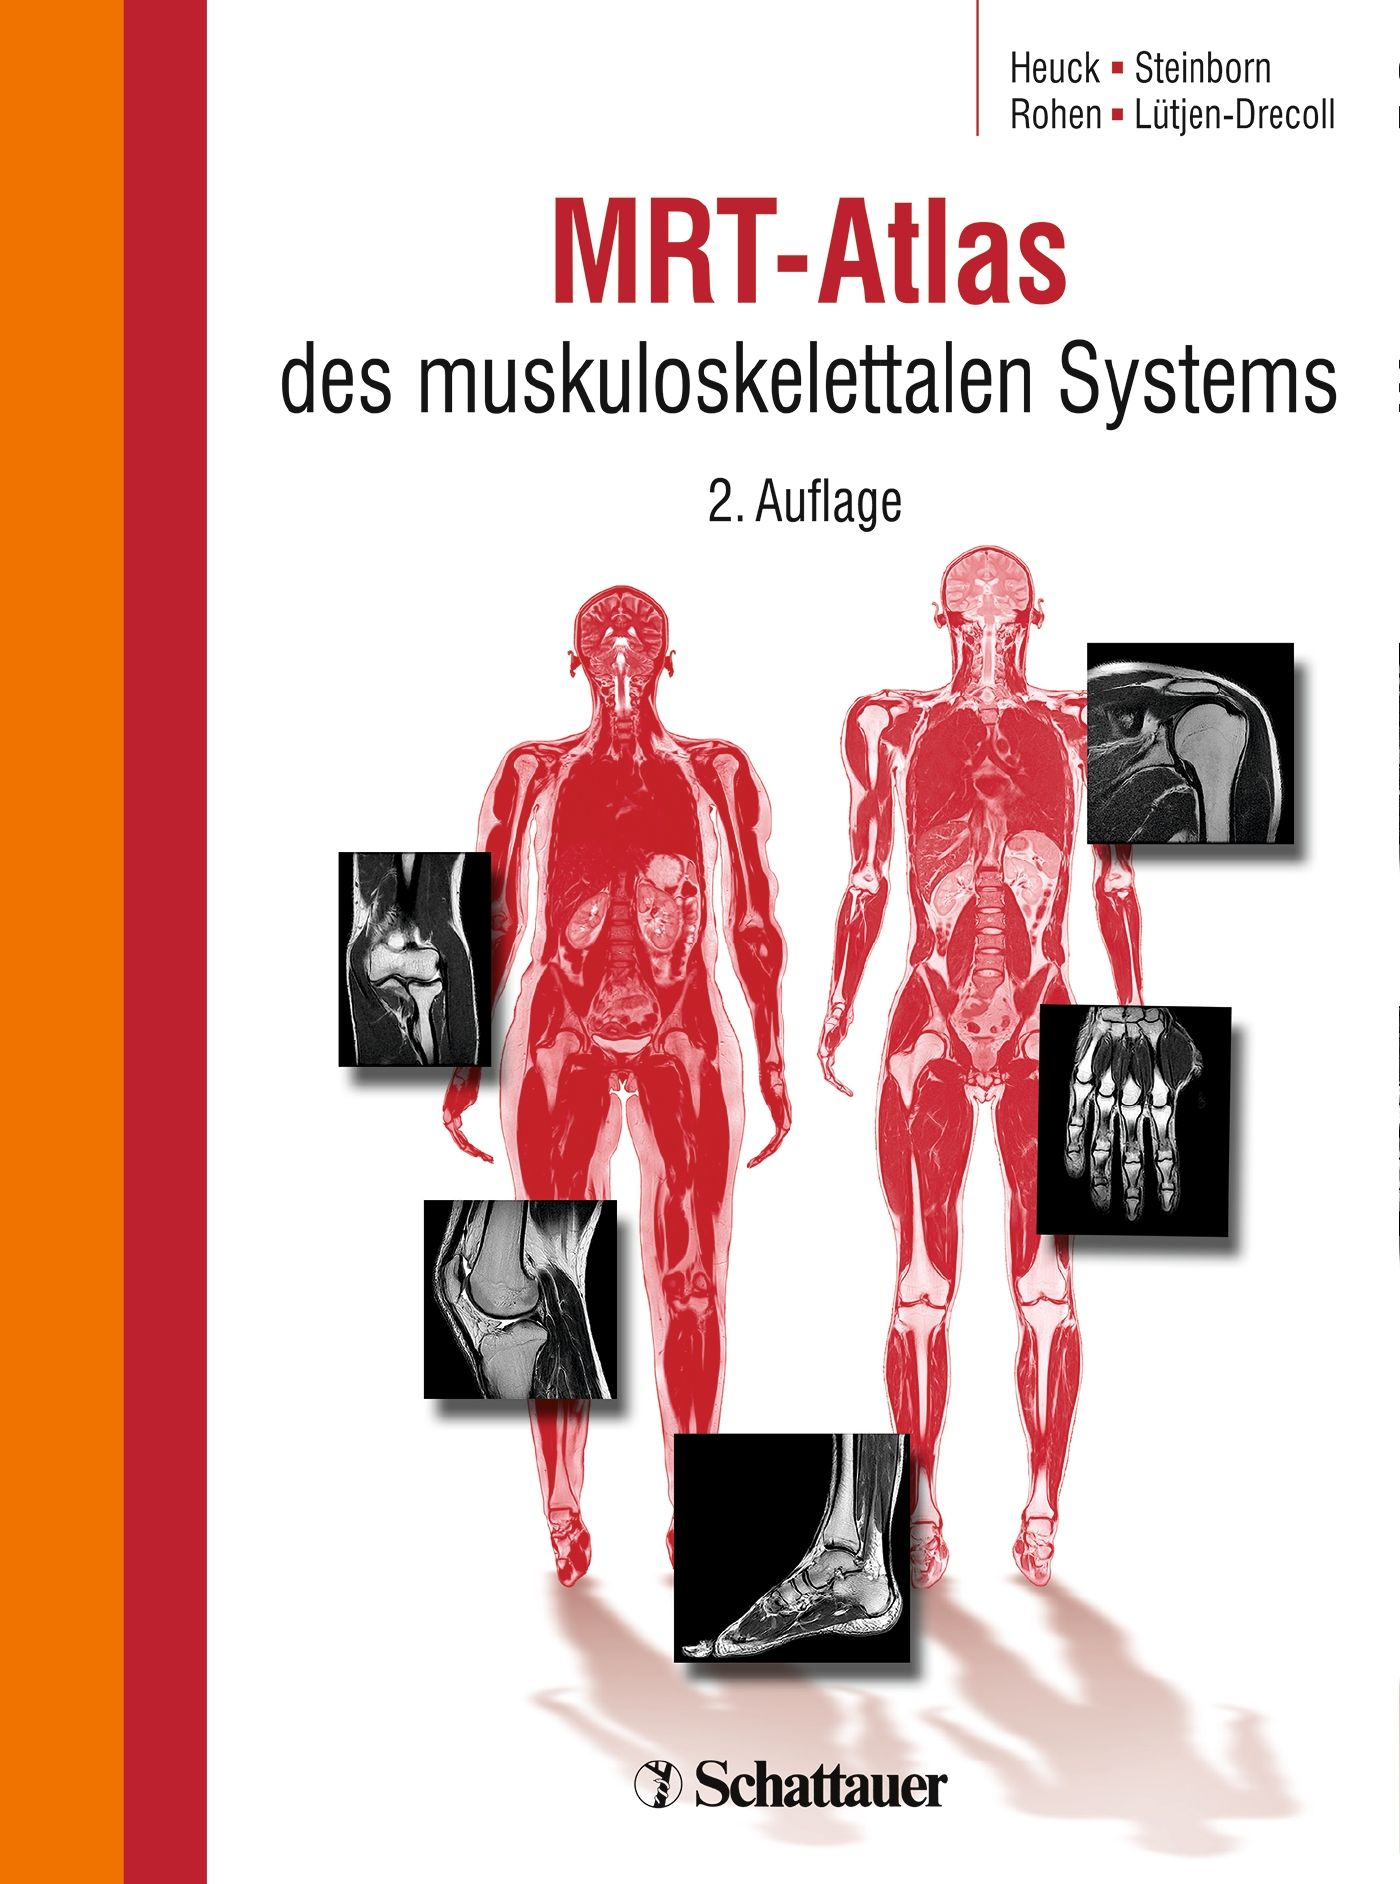 MRT-Atlas des muskuloskelettalen Systems von Heuck, Andreas, Lütjen-D